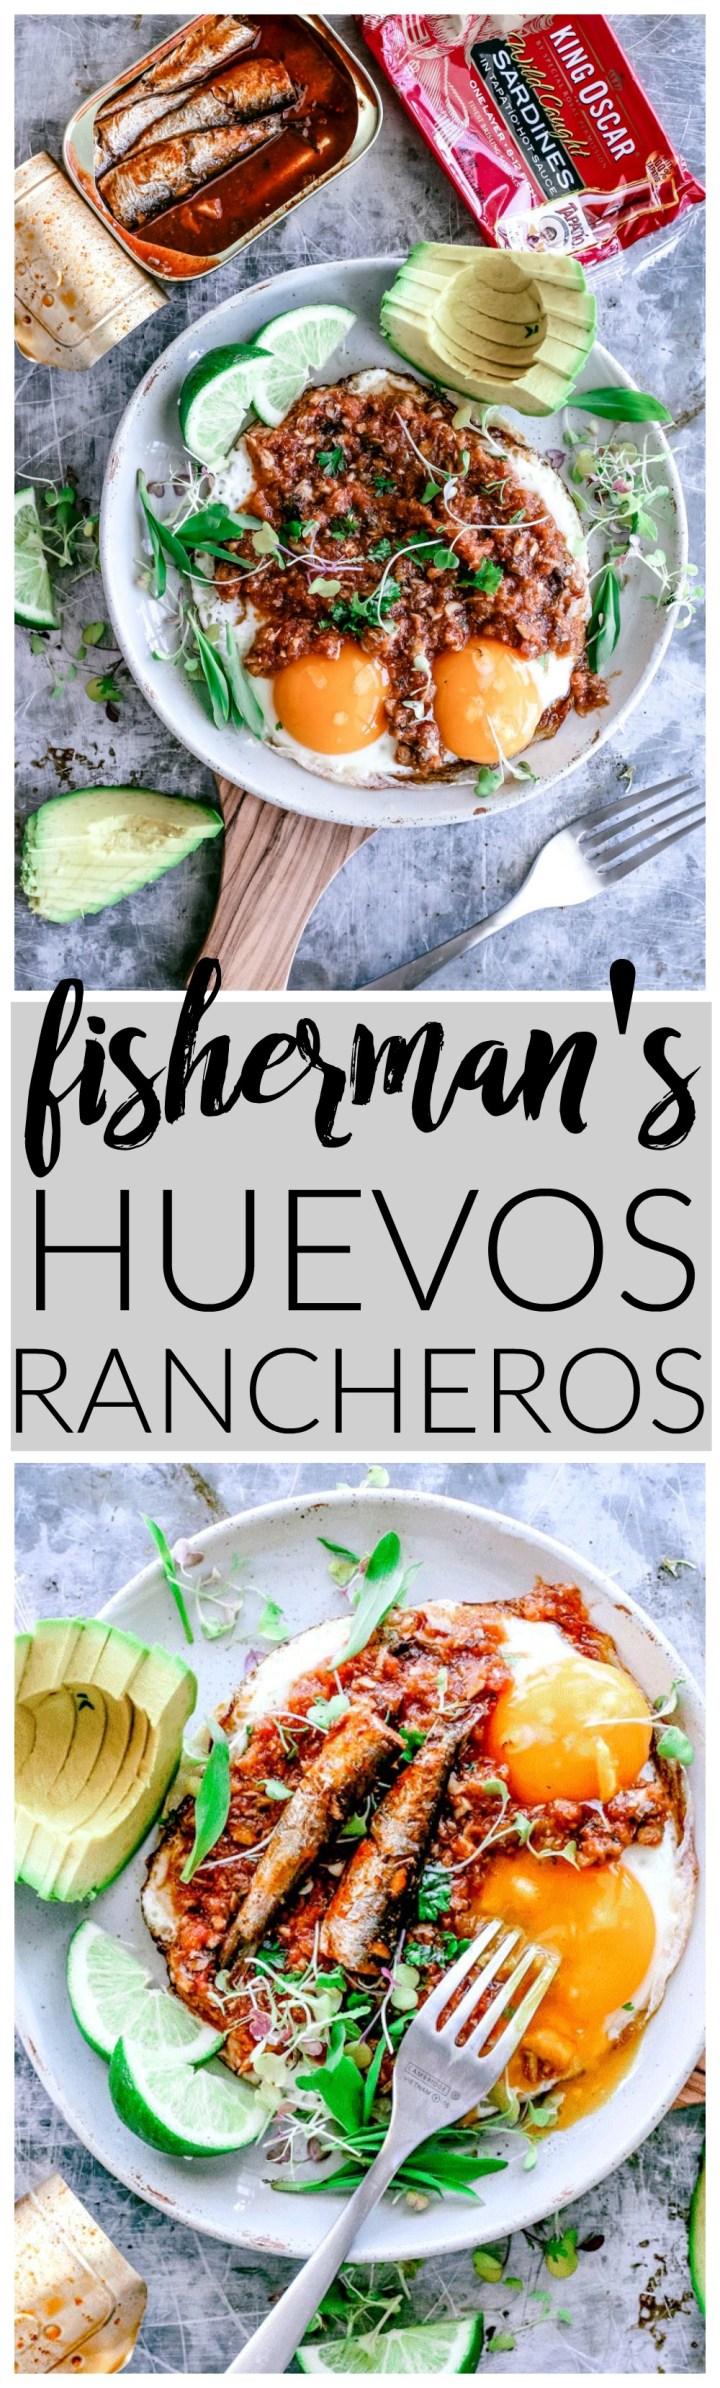 Fisherman's Huevos Rancheros | Killing Thyme